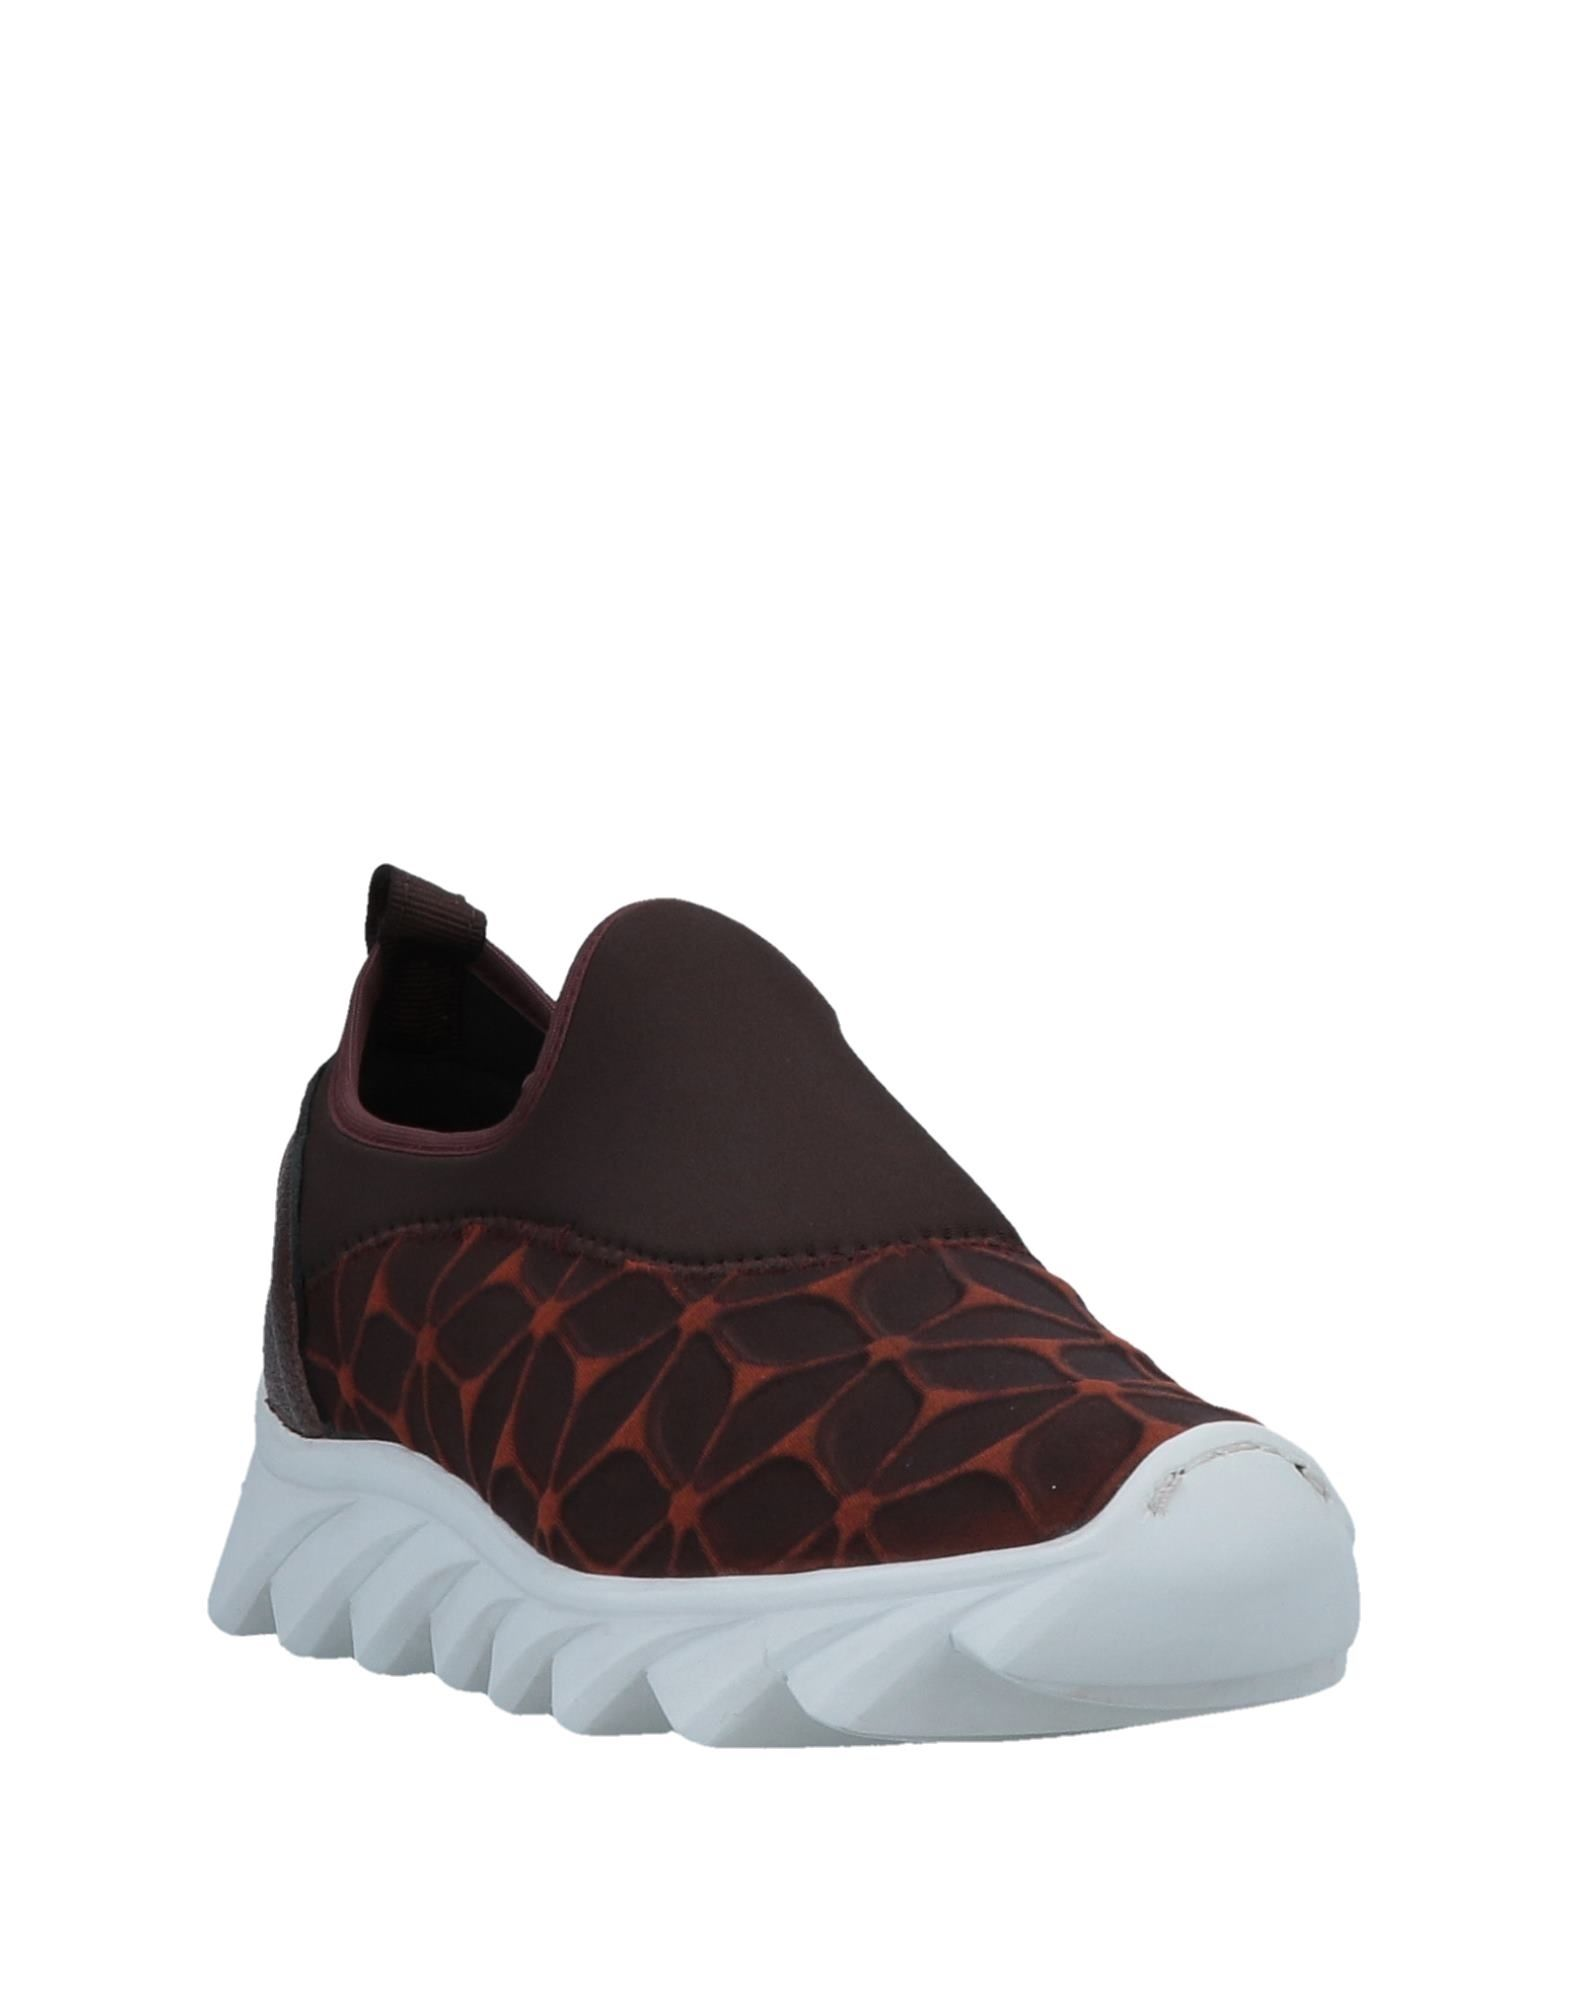 Ras 11511545CE Sneakers Damen  11511545CE Ras Gute Qualität beliebte Schuhe 088e64